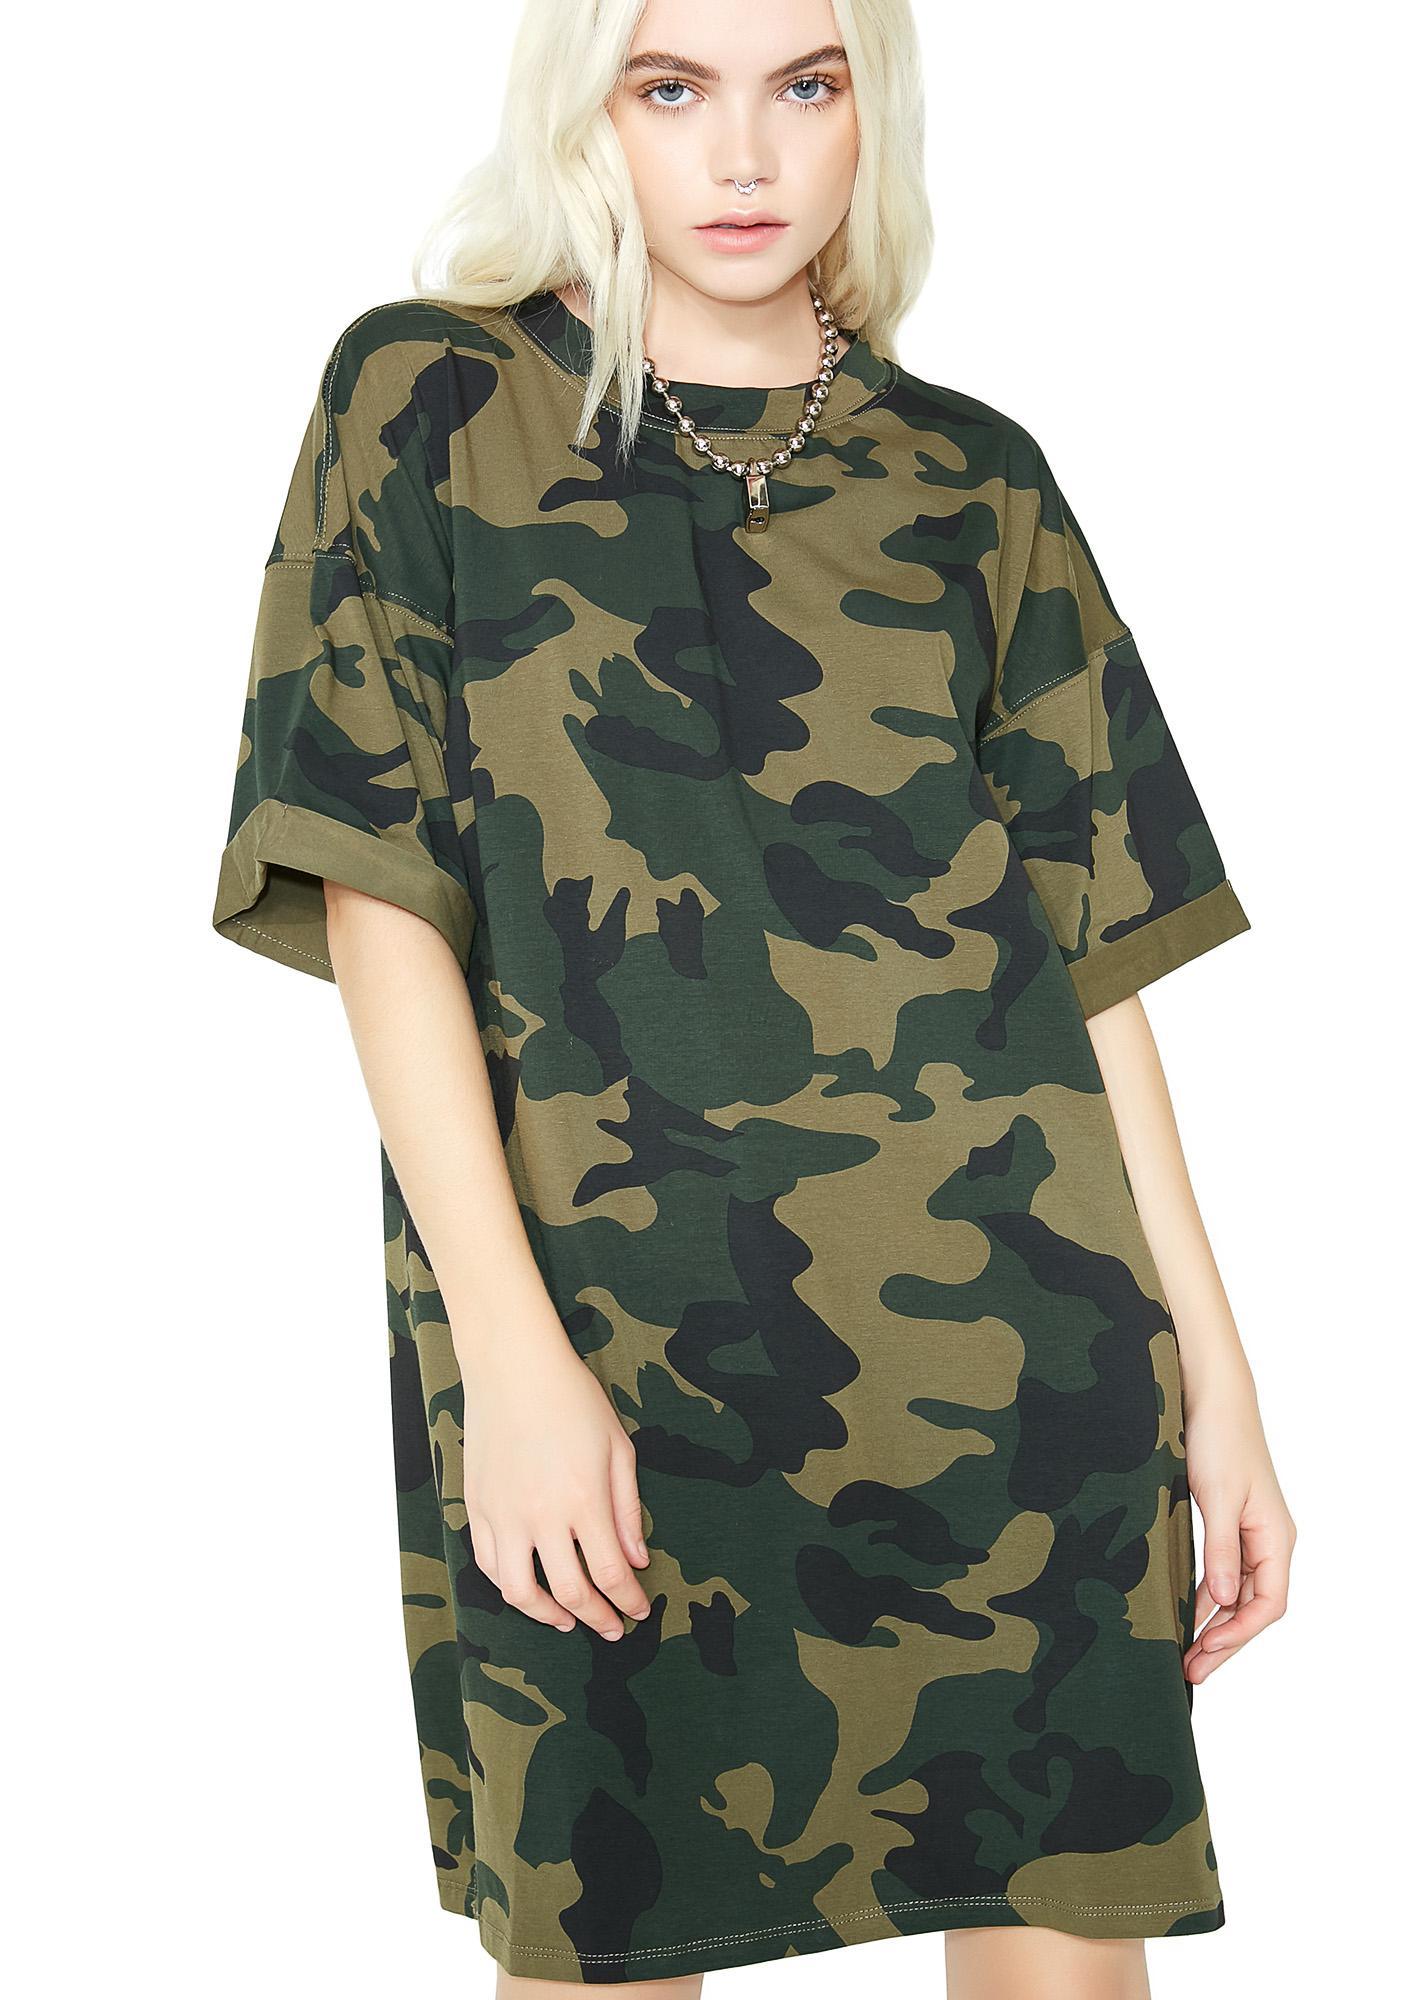 Full Force Camo T-Shirt Dress